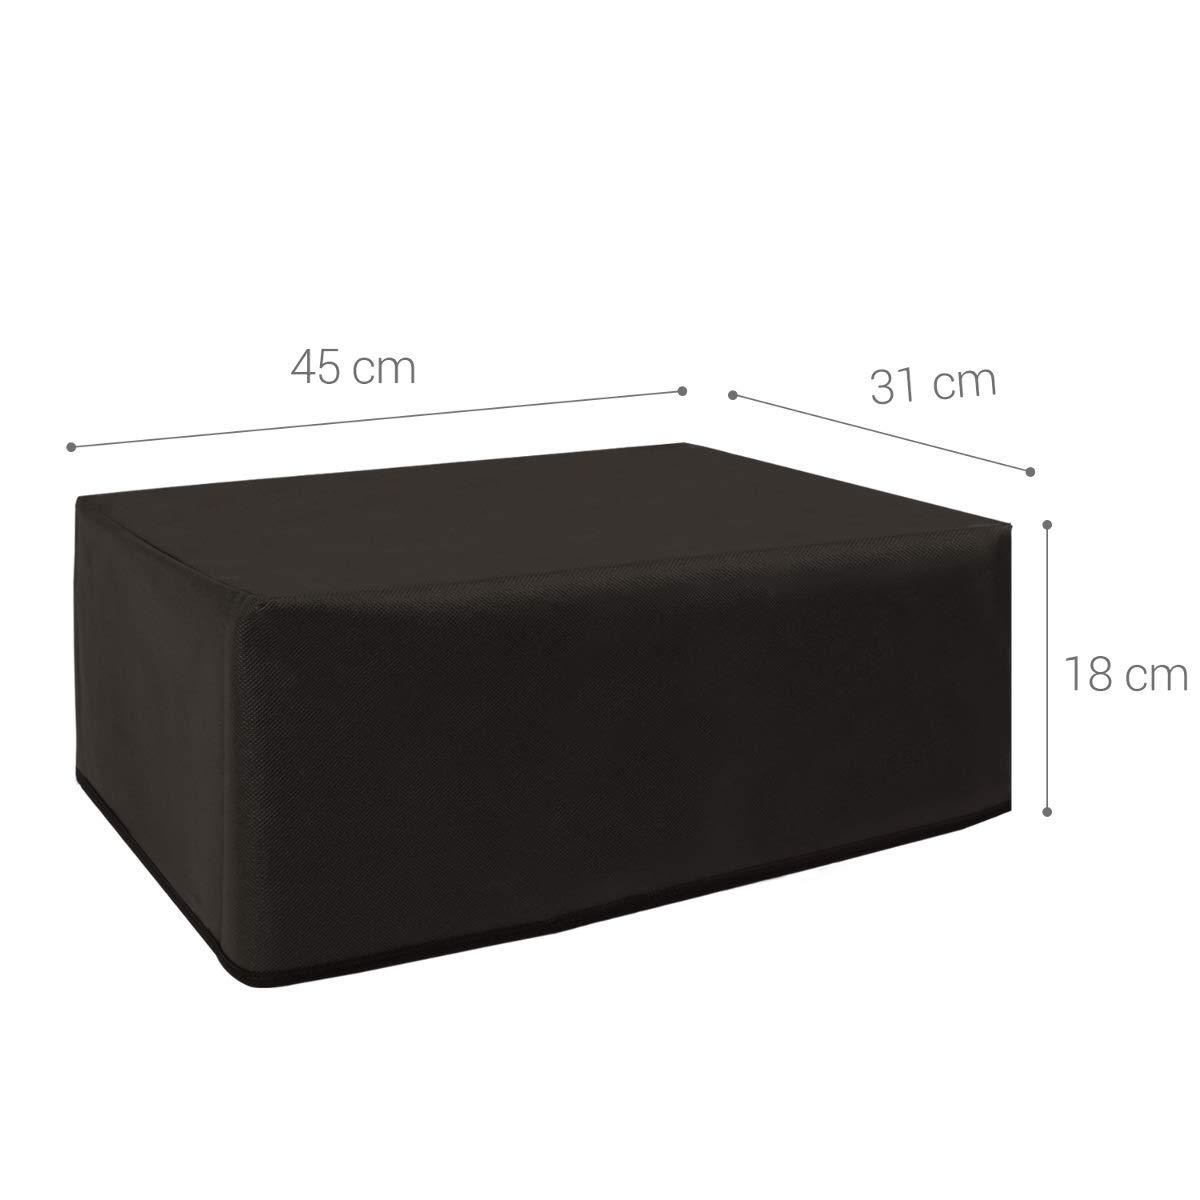 kwmobile Funda para Epson EcoTank ET-2600/2650 - Cubierta Protectora Antipolvo de Impresora - Forro Protector Gris Oscuro